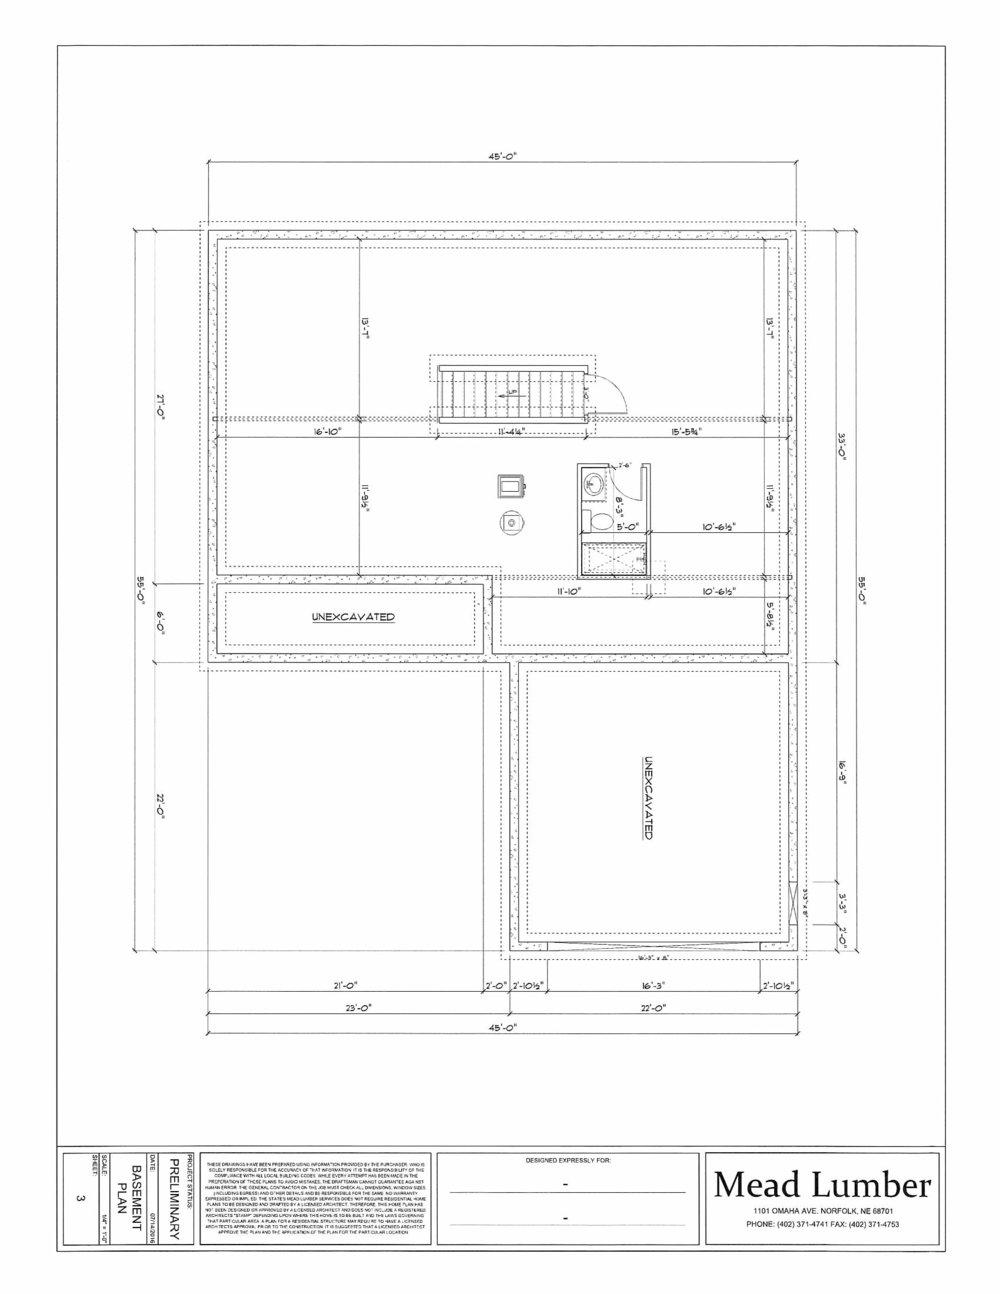 Land Mark Realty_20181025_081505_0001.jpg